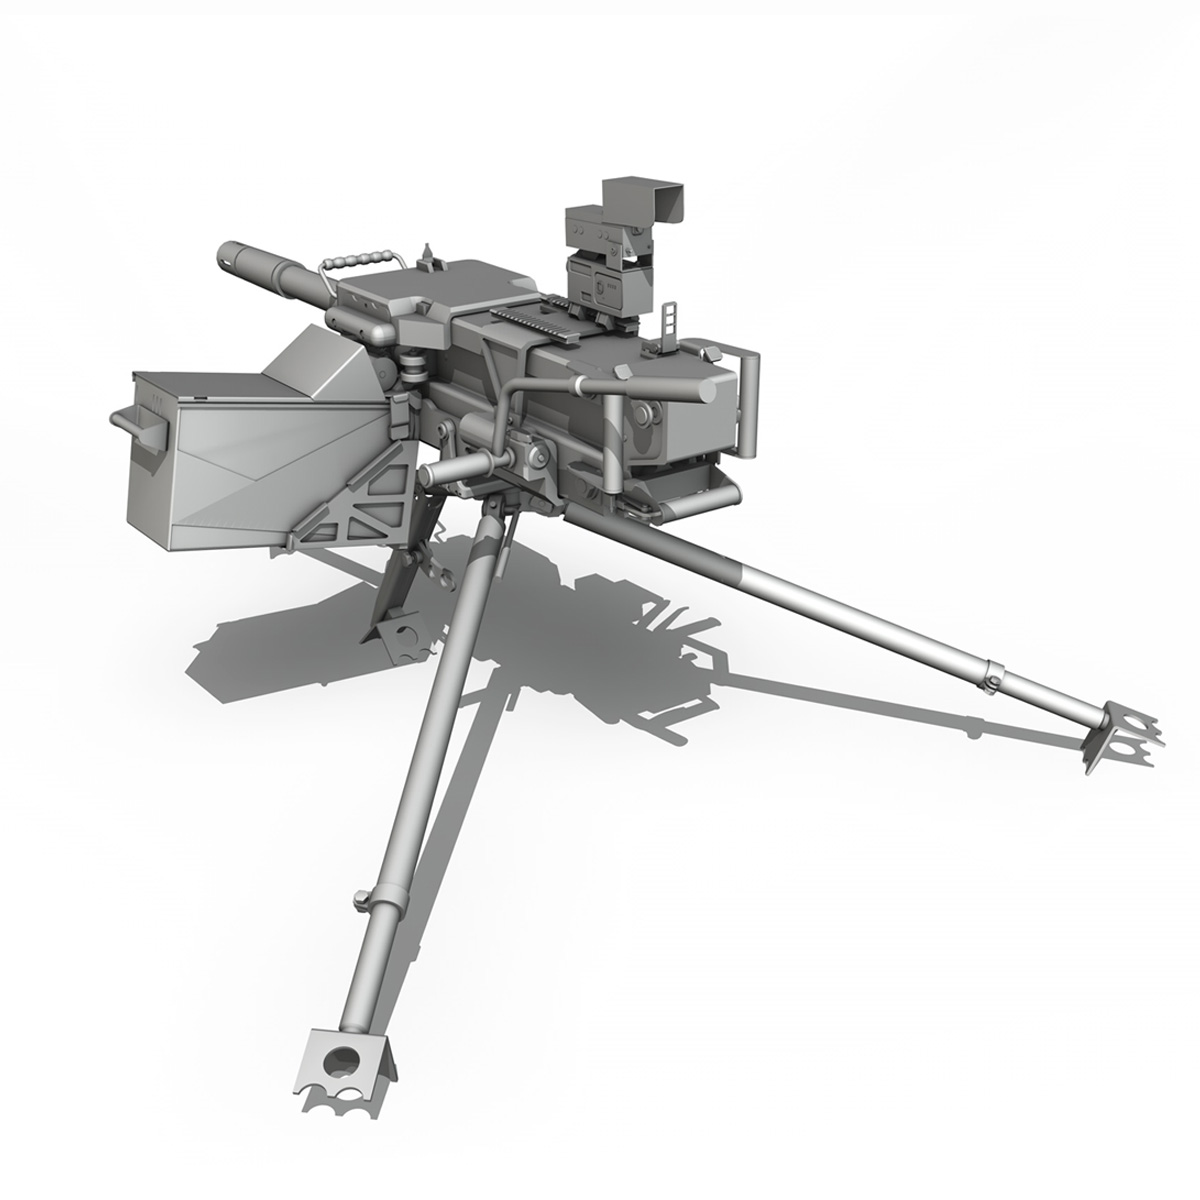 40mm qumbara pulemyotu gmg 3d model c4d lwo 3dm obj 264299